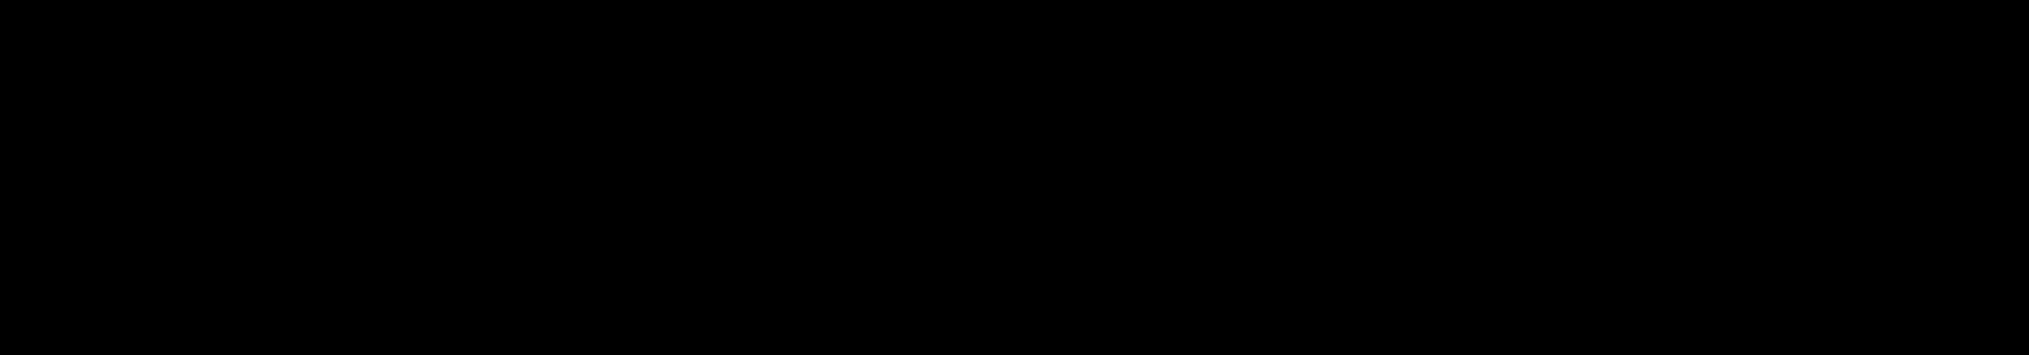 Mila zb